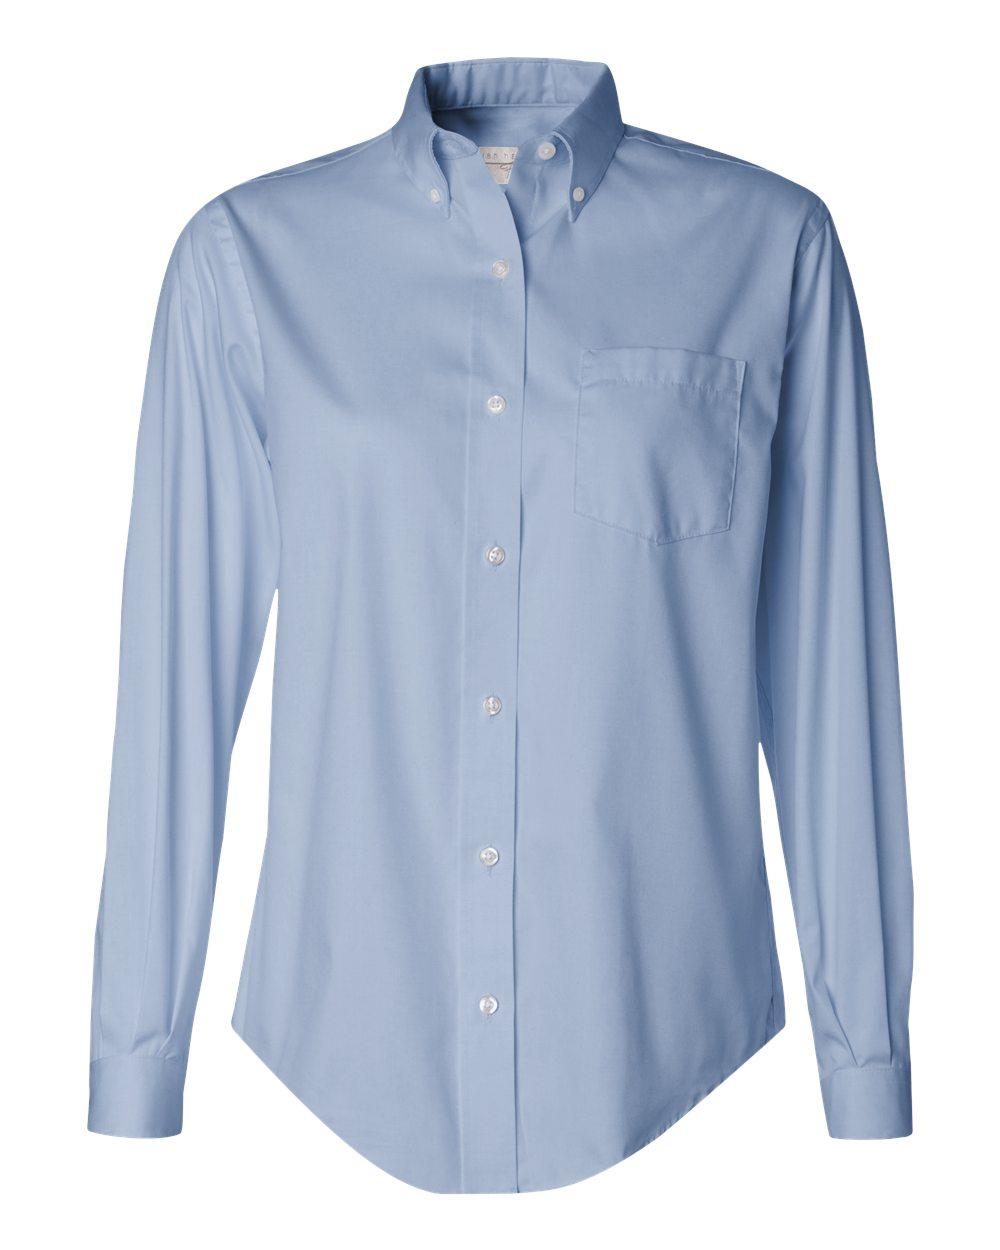 Women's Pinpoint Oxford Shirt